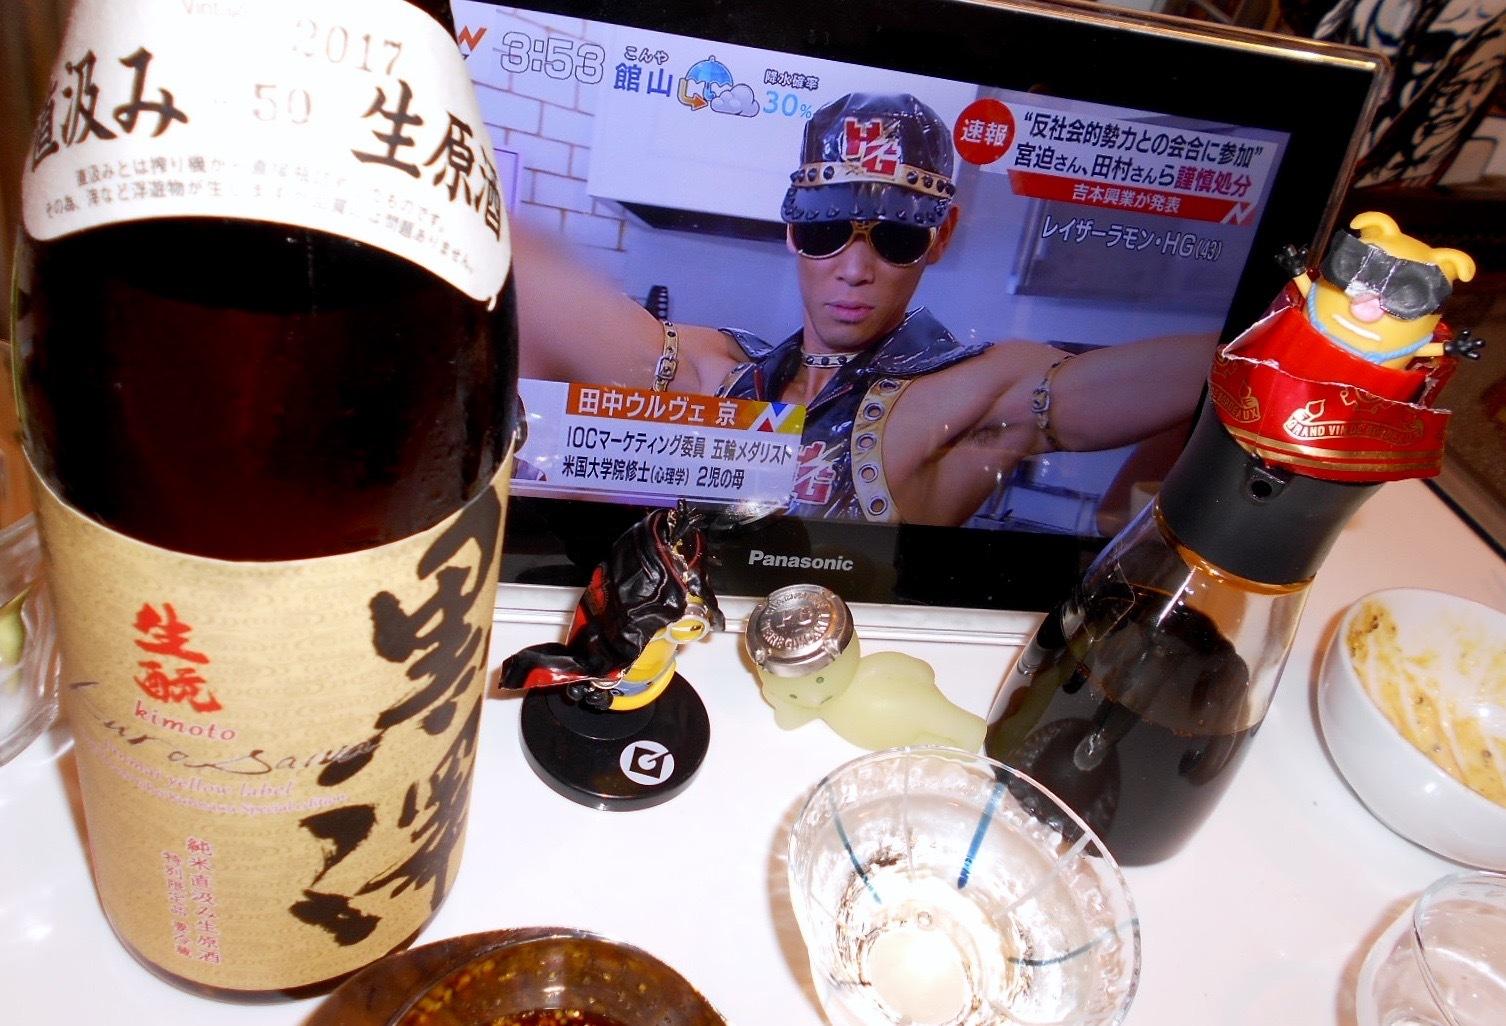 kurosawa_yellow29by6_4.jpg